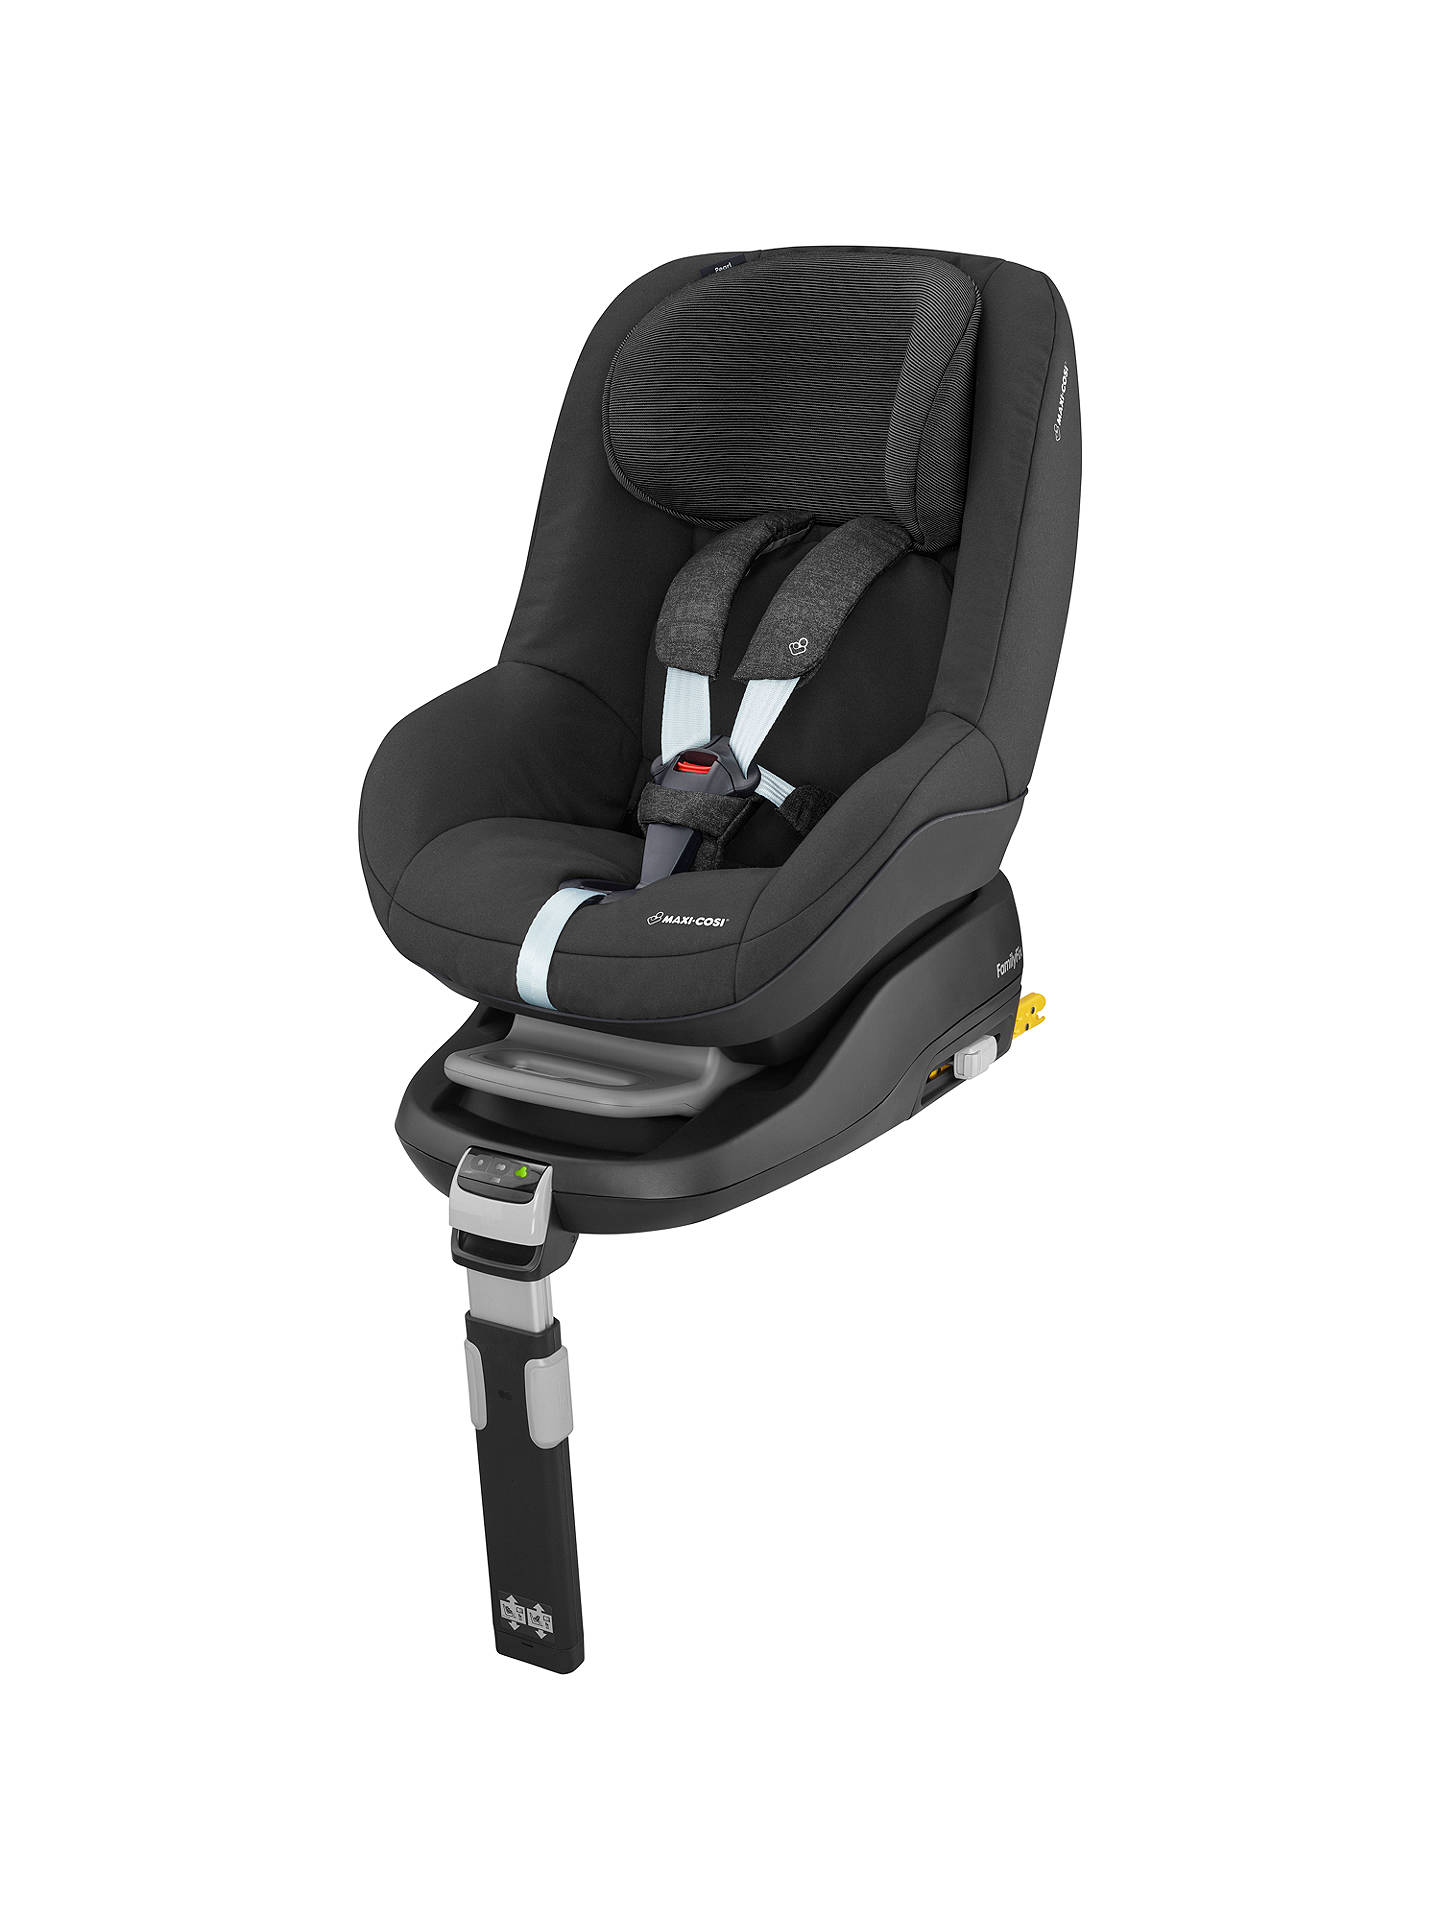 maxi cosi pearl group 1 car seat nomad black at john lewis partners. Black Bedroom Furniture Sets. Home Design Ideas